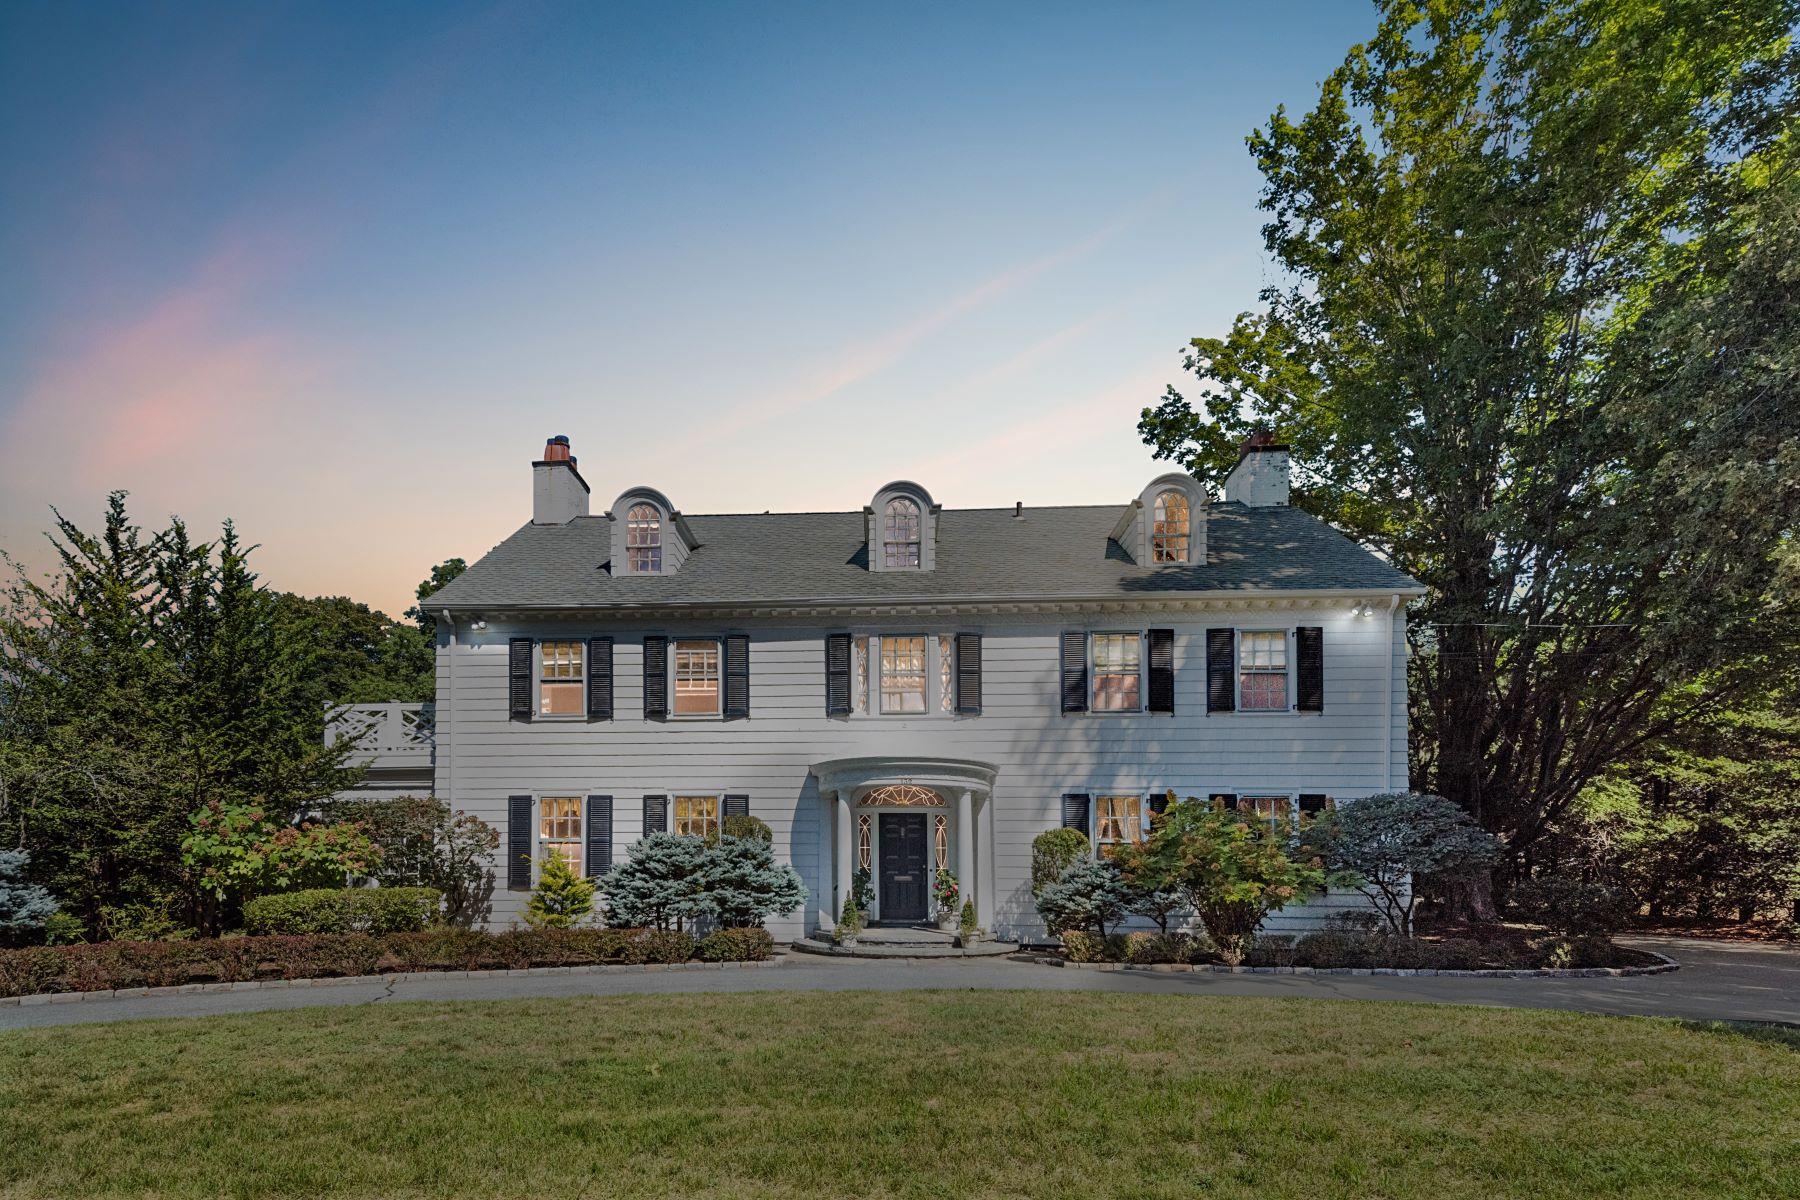 single family homes voor Verkoop op 132 Nayatt Rd, Barrington, RI Barrington, Rhode Island 02806 Verenigde Staten